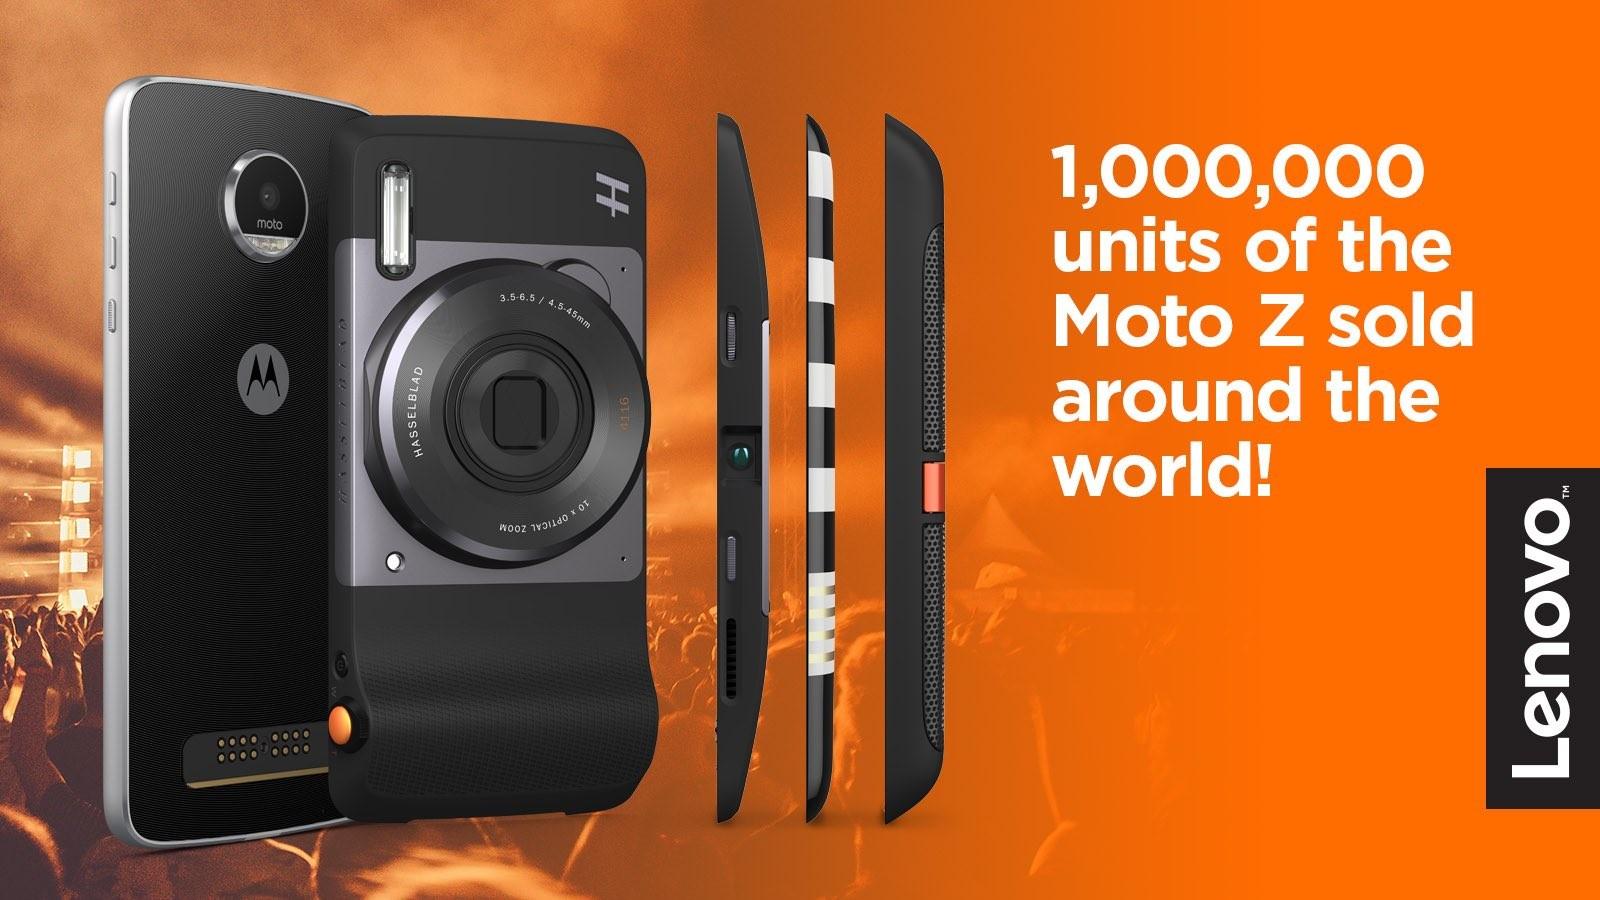 1-million-moto-z-sales